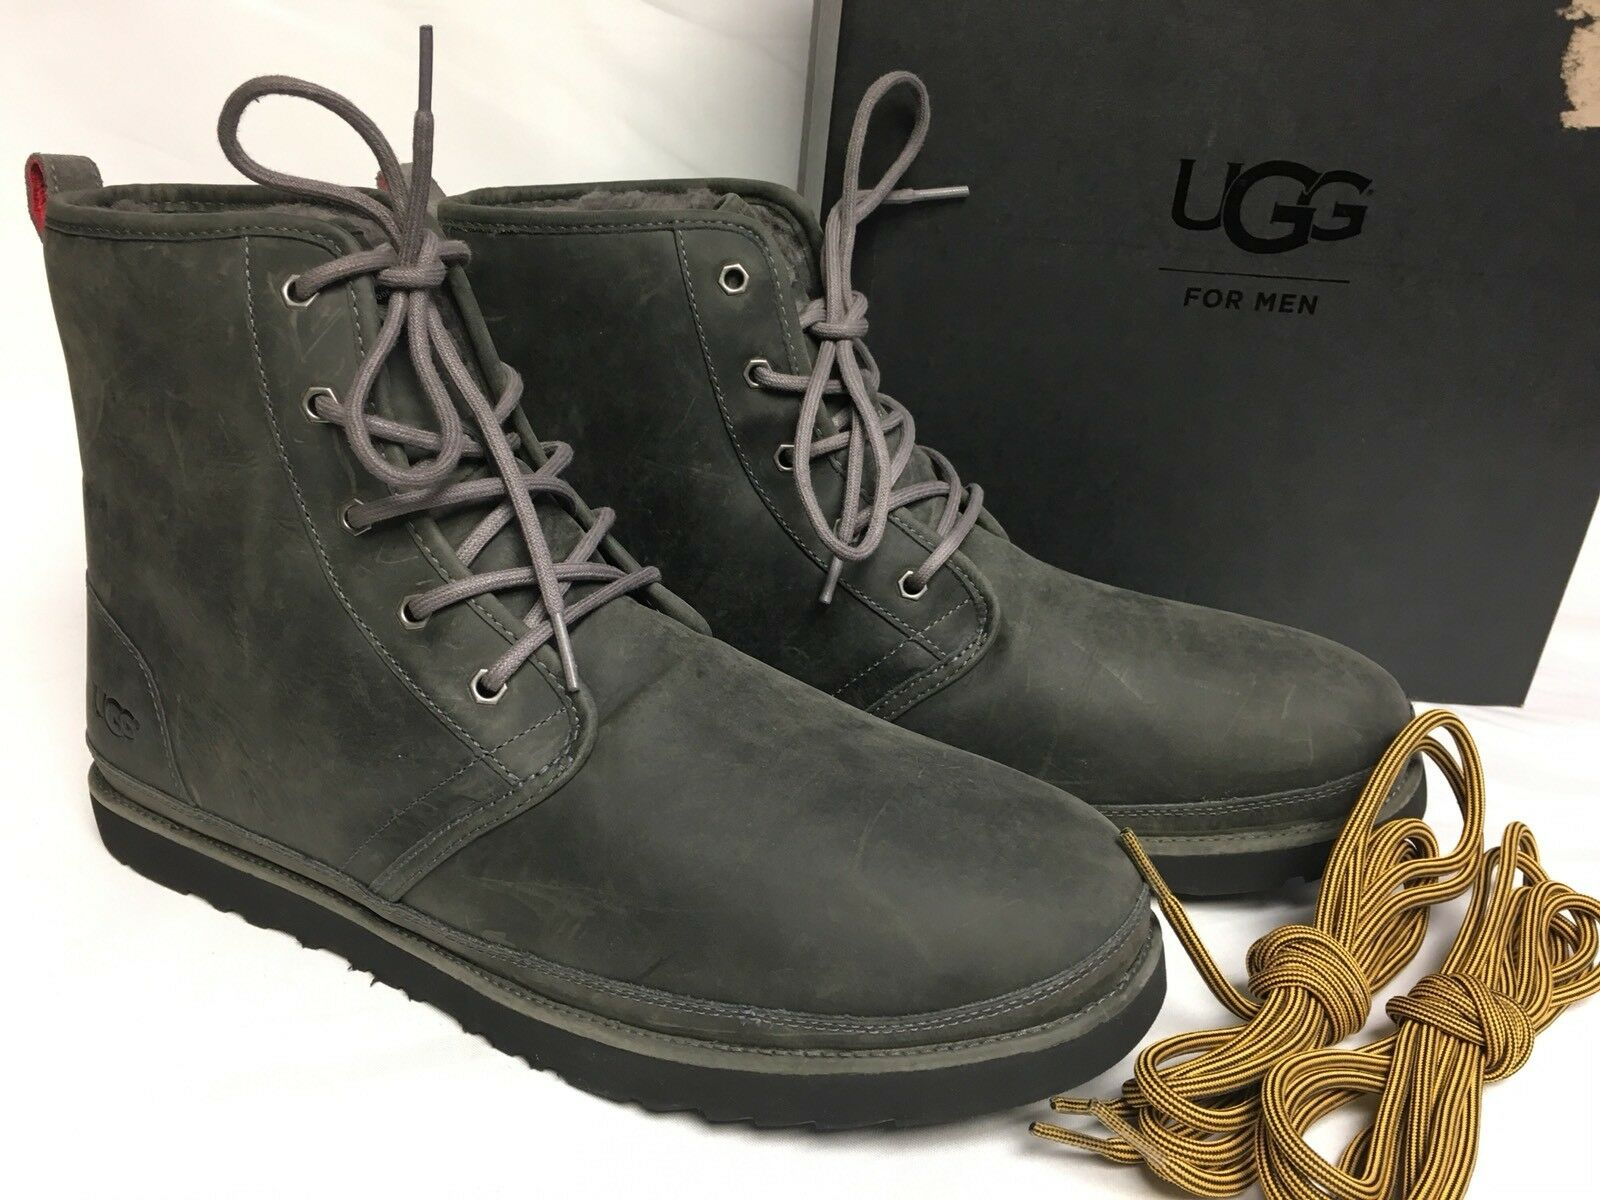 5ccccdfa42b UGG Men's Harkley Waterproof Ankle Boot 6 M Charcoal Full Grain Leather